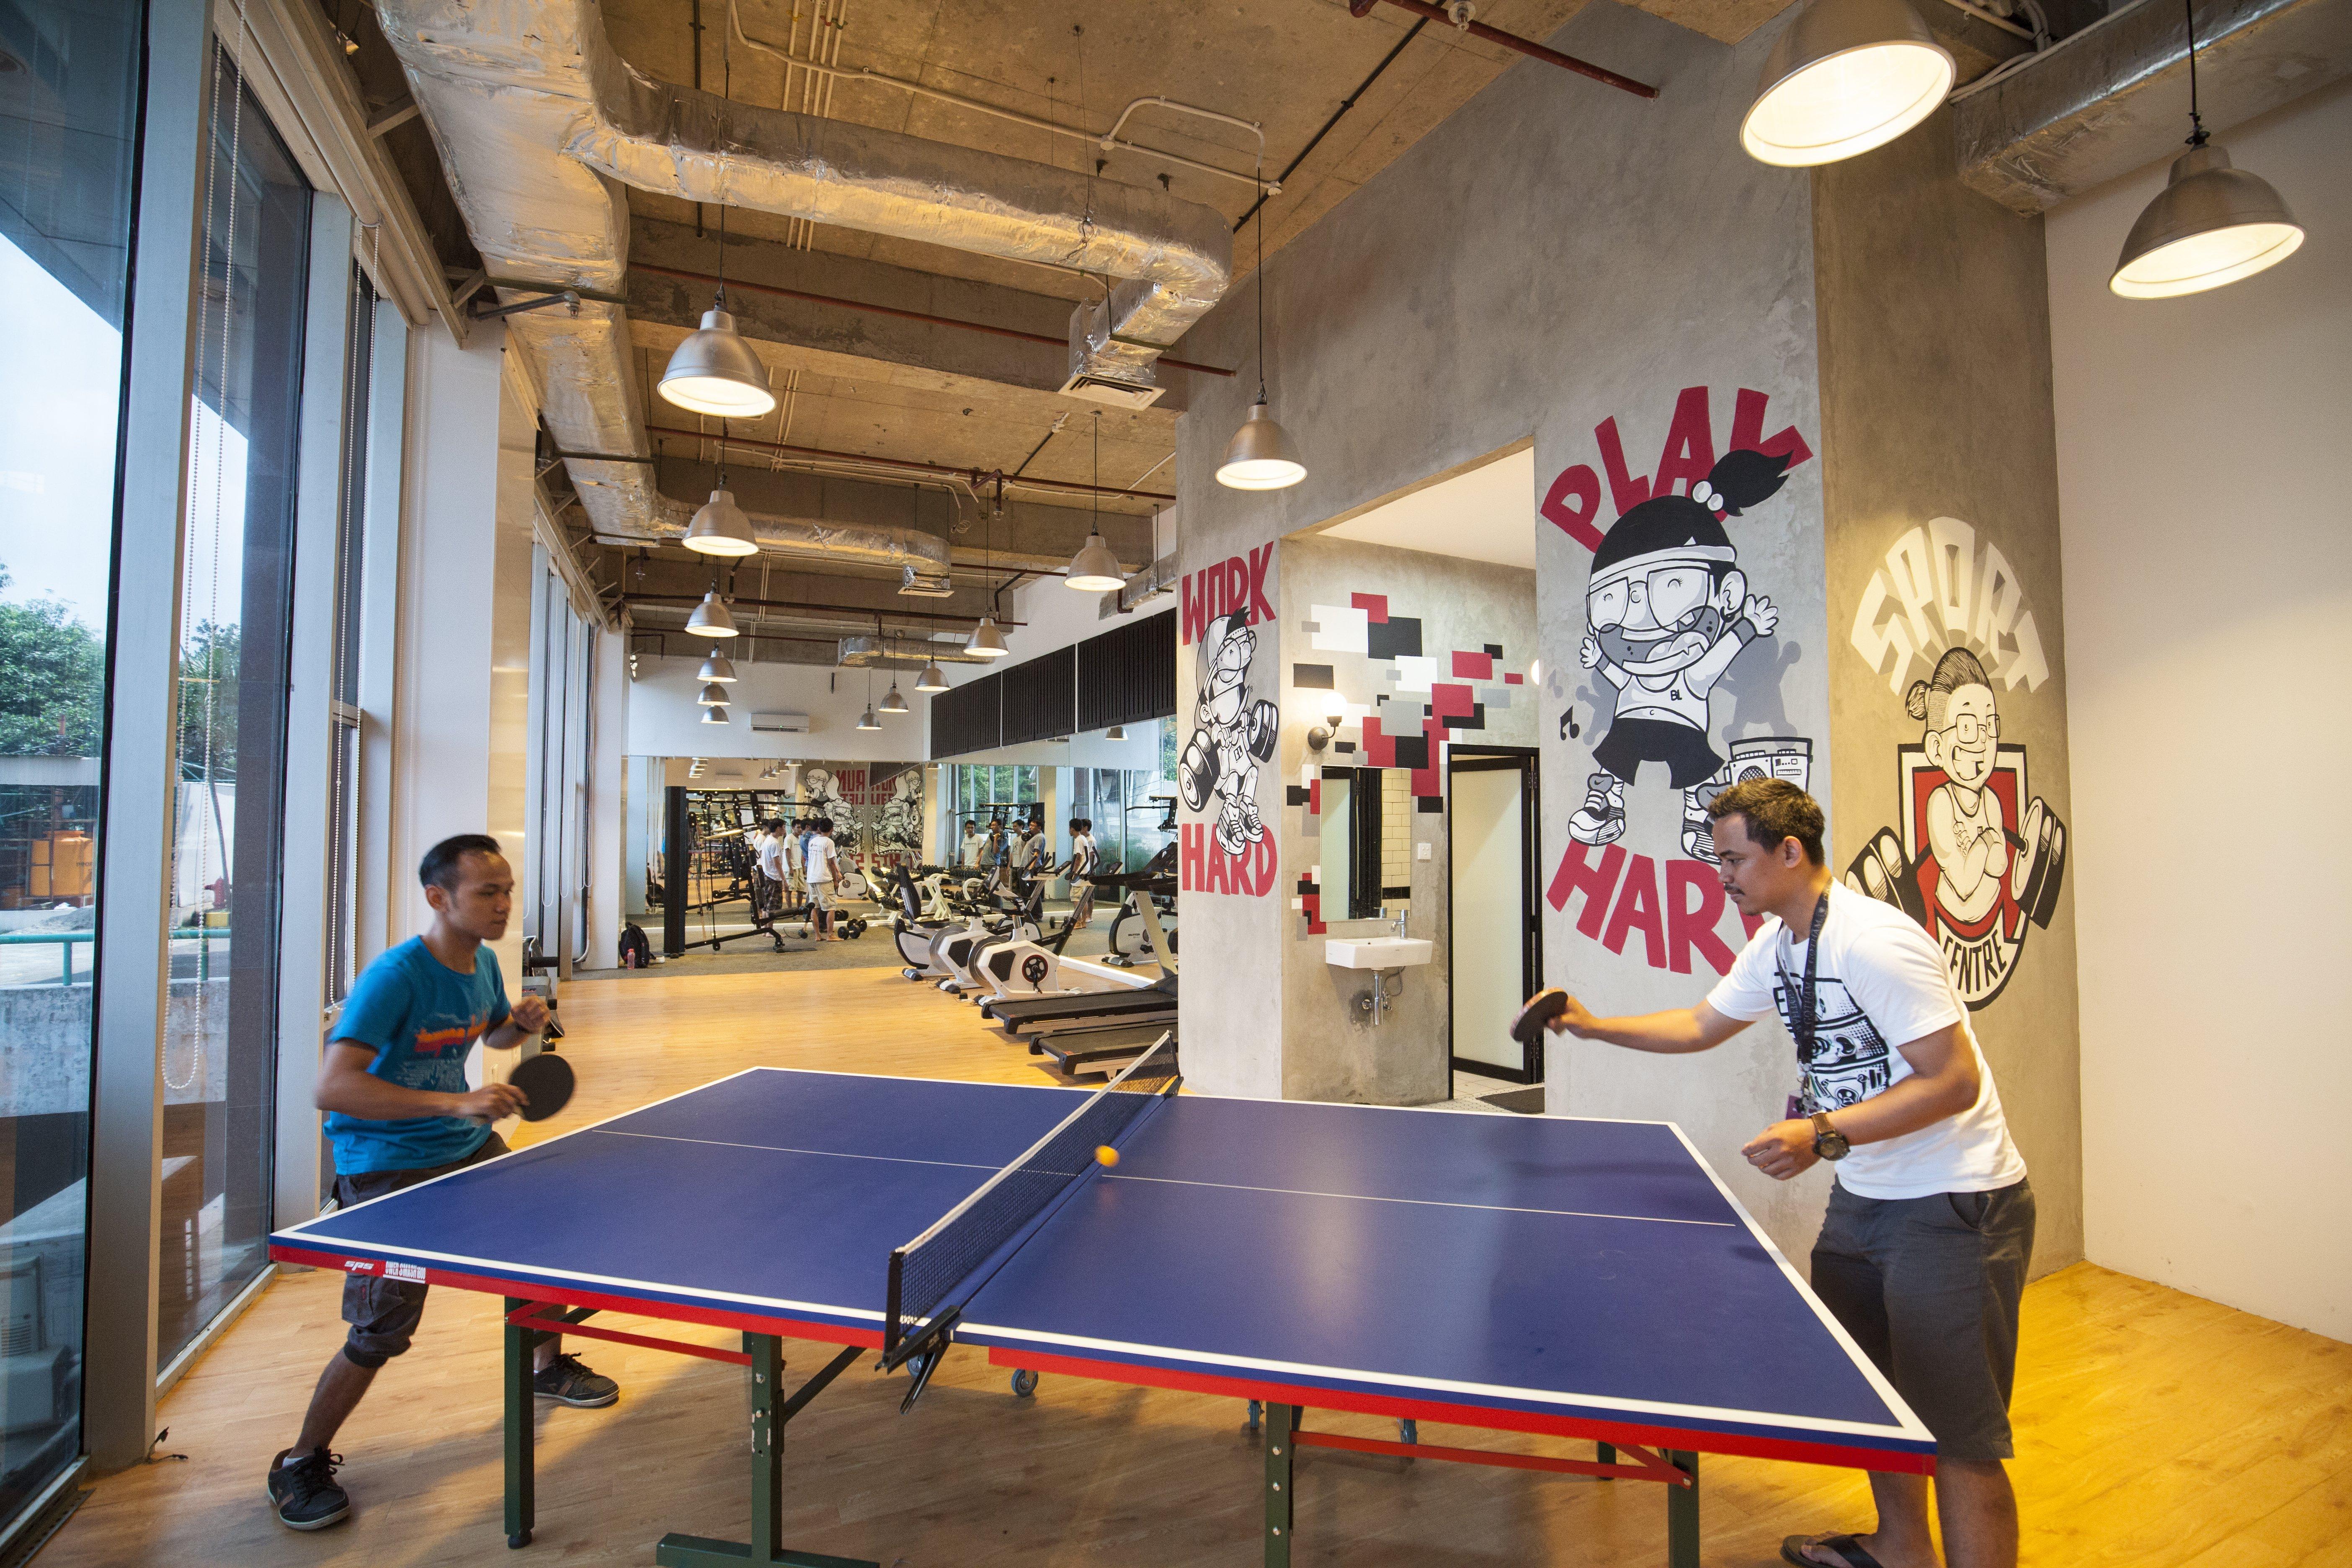 Sport centre di tempat kerja bikin kamu makin semangat